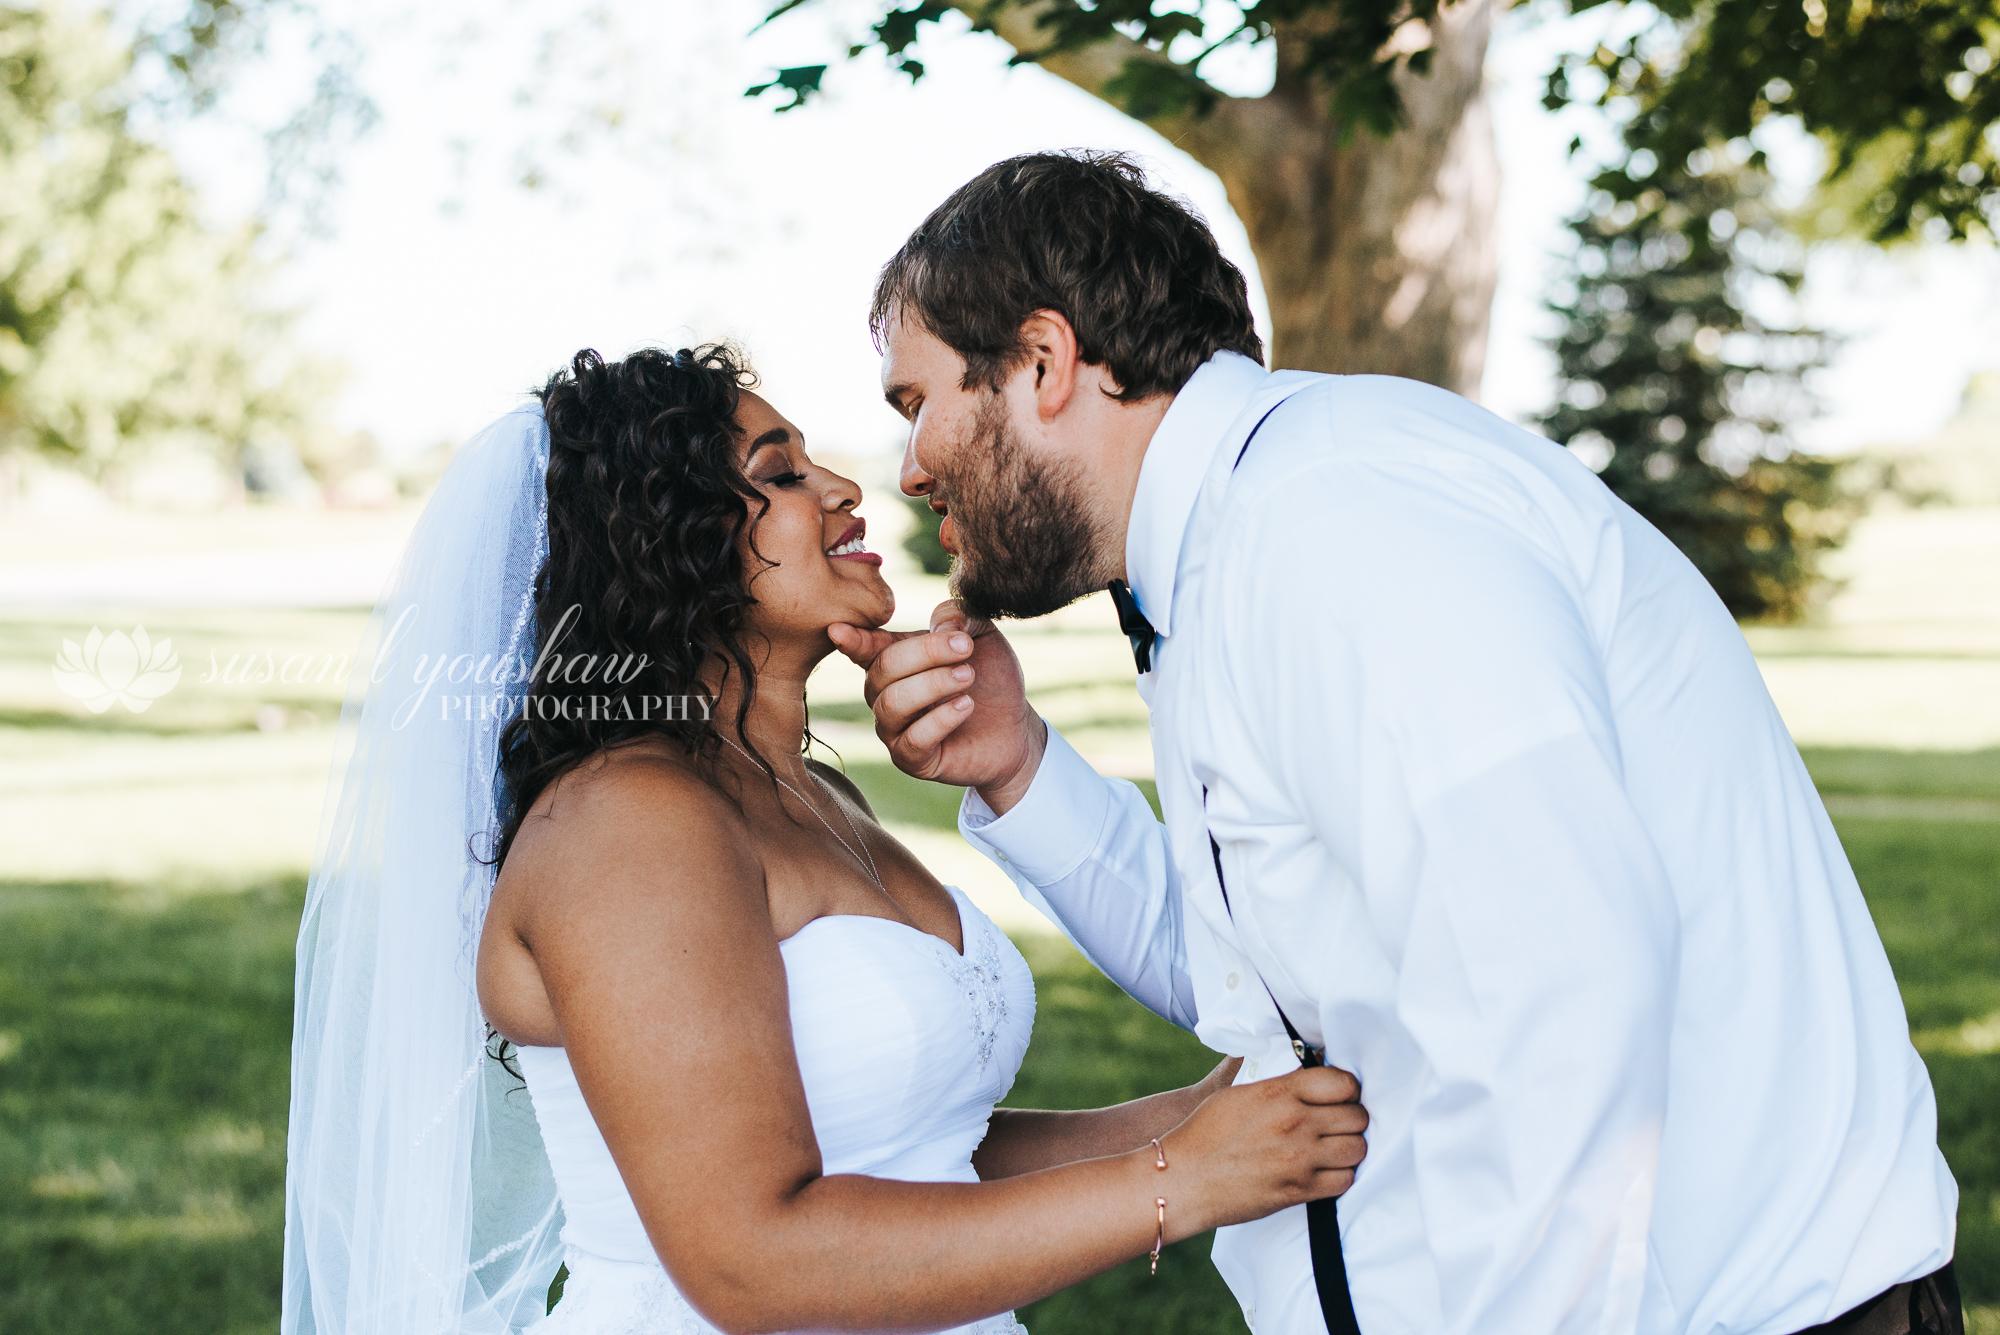 Katelyn and Wes Wedding Photos 07-13-2019 SLY Photography-102.jpg